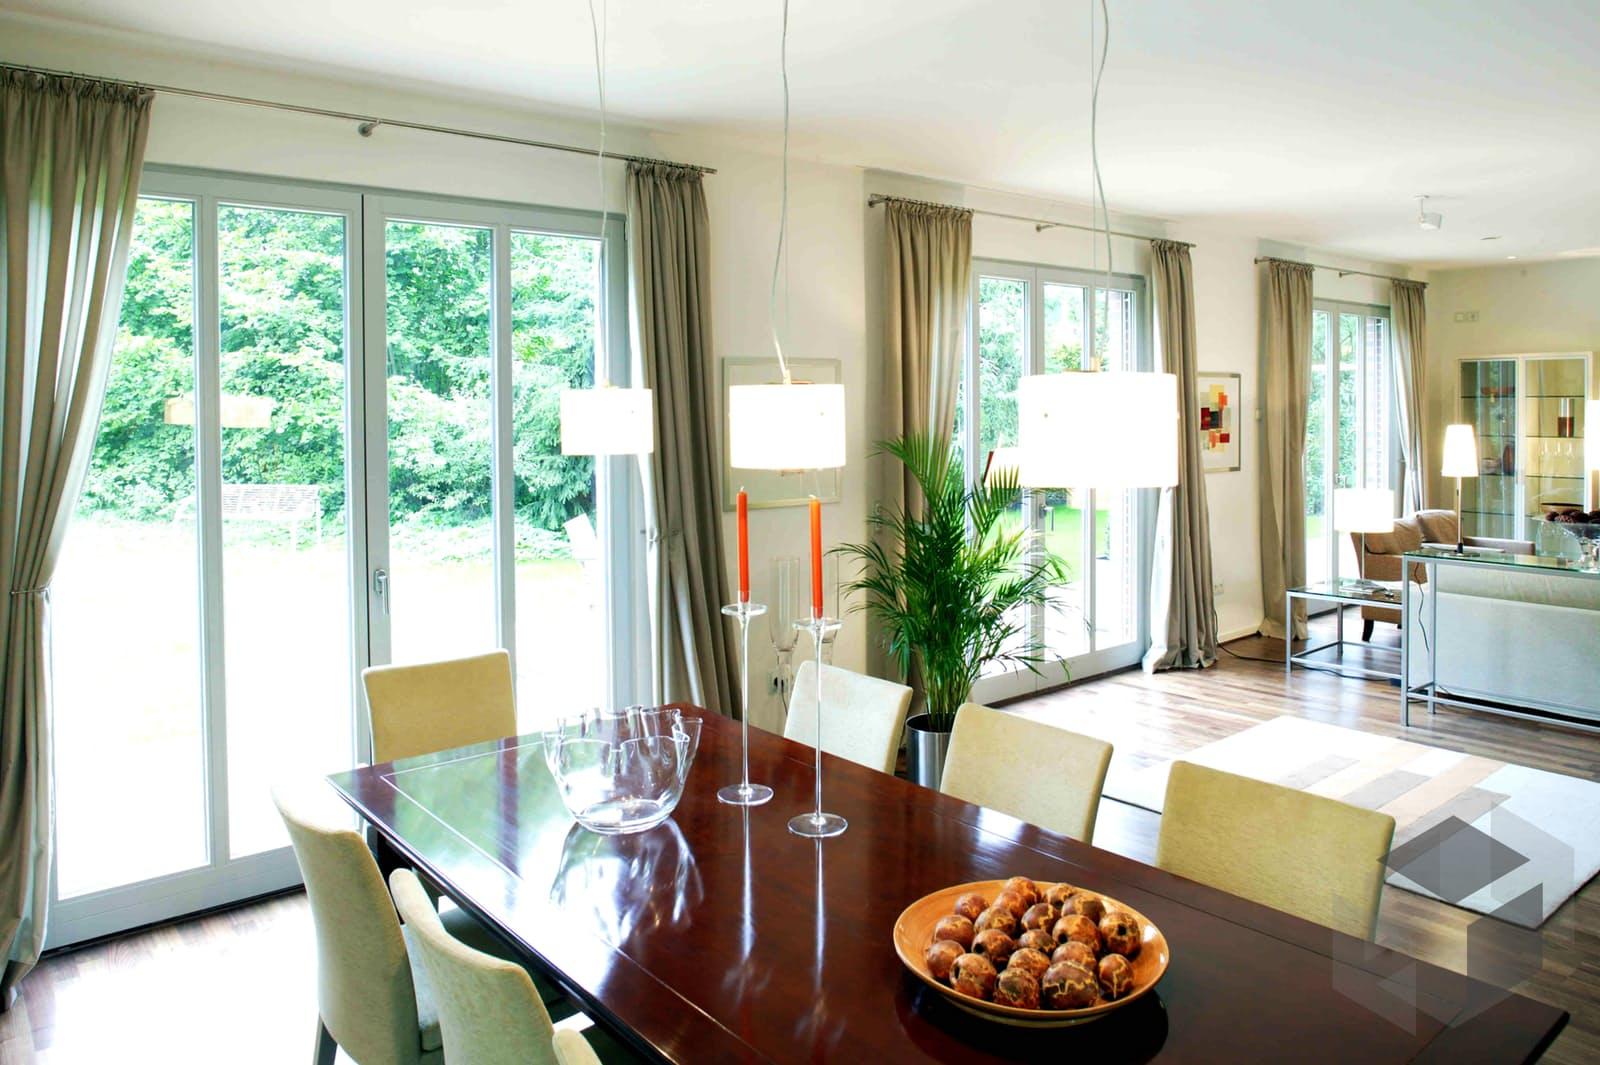 Stadtvilla von haacke haus klassisch individuell for Stadtvilla klassisch